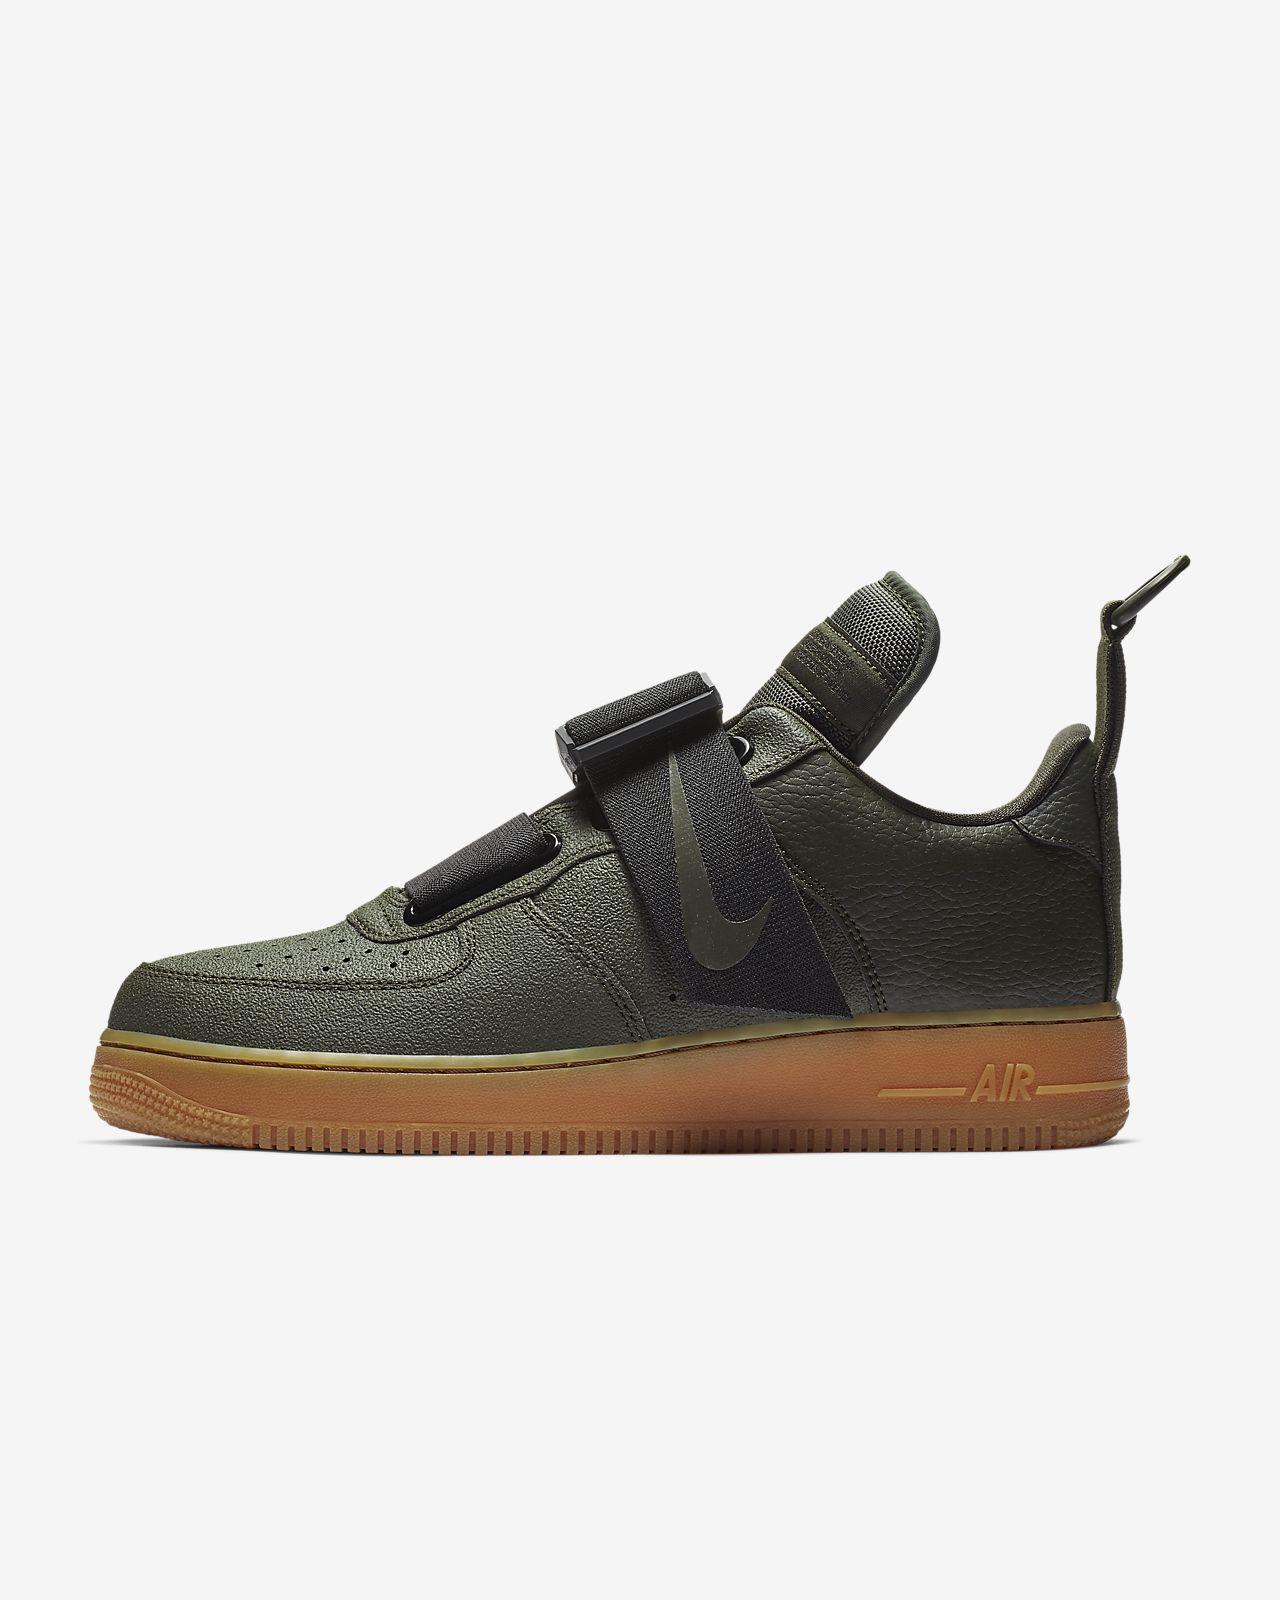 acc5add91860 ... Nike Air Force 1 Utility Men s Shoe